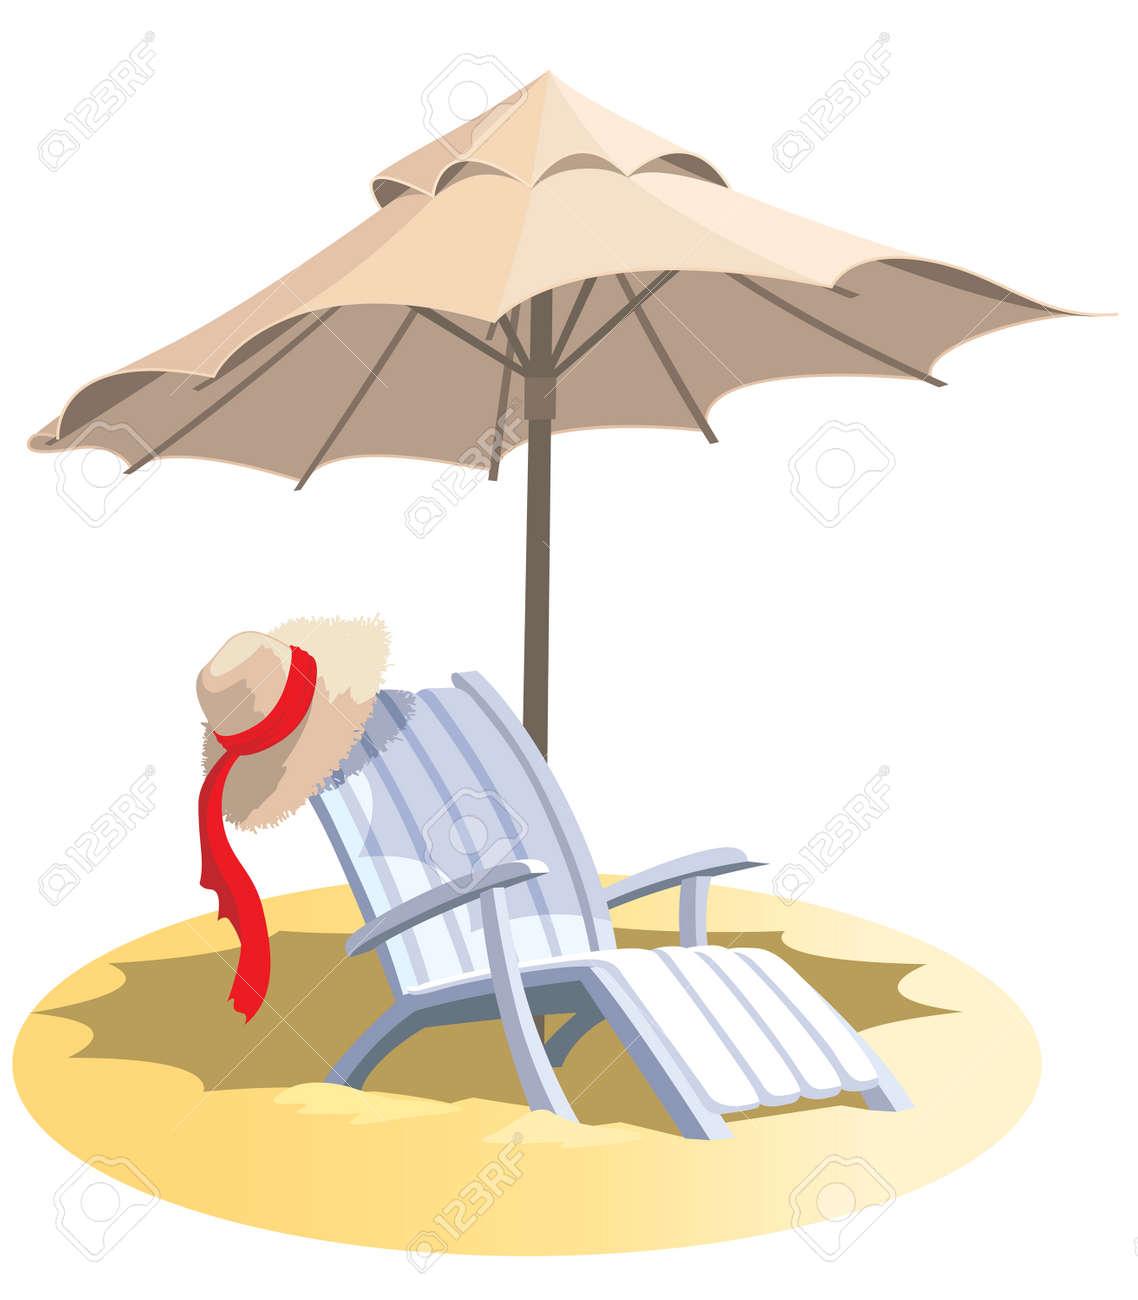 Sonnenschirm clipart gratis  Sandburg Clipart | ambiznes.com